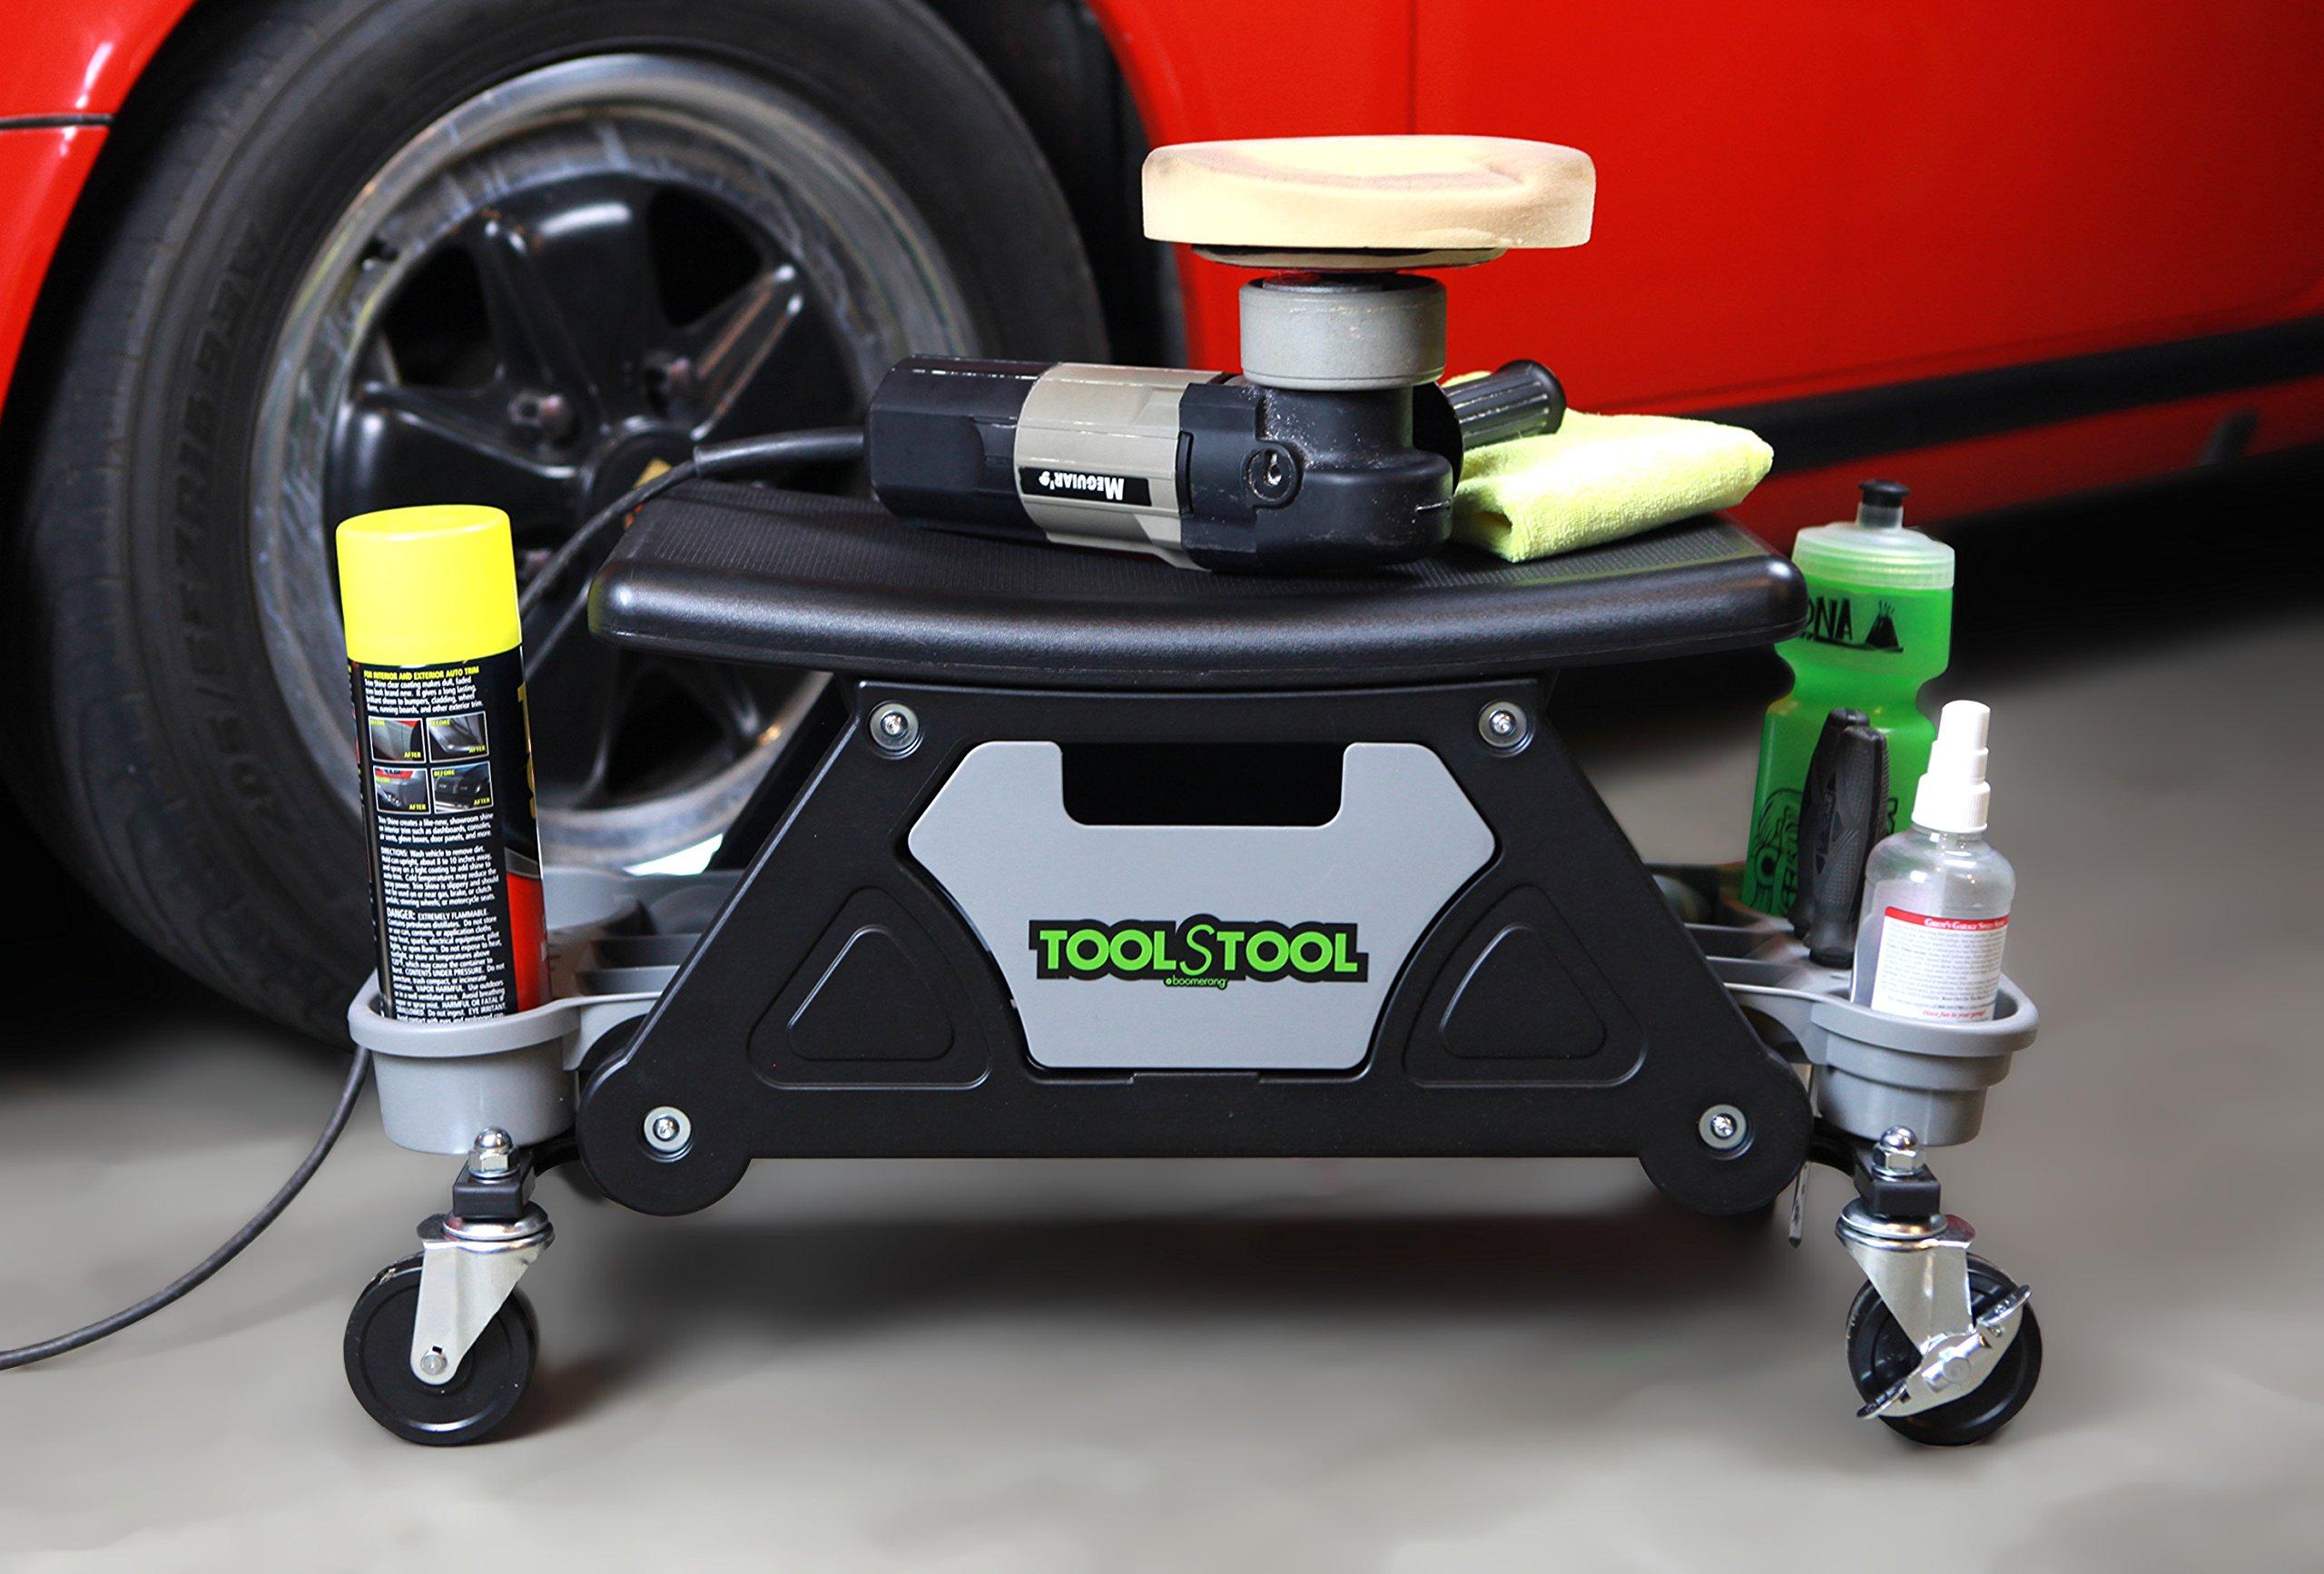 Boomerang ToolStool Roller-Seat Shop-Cart by Boomerang (Image #9)